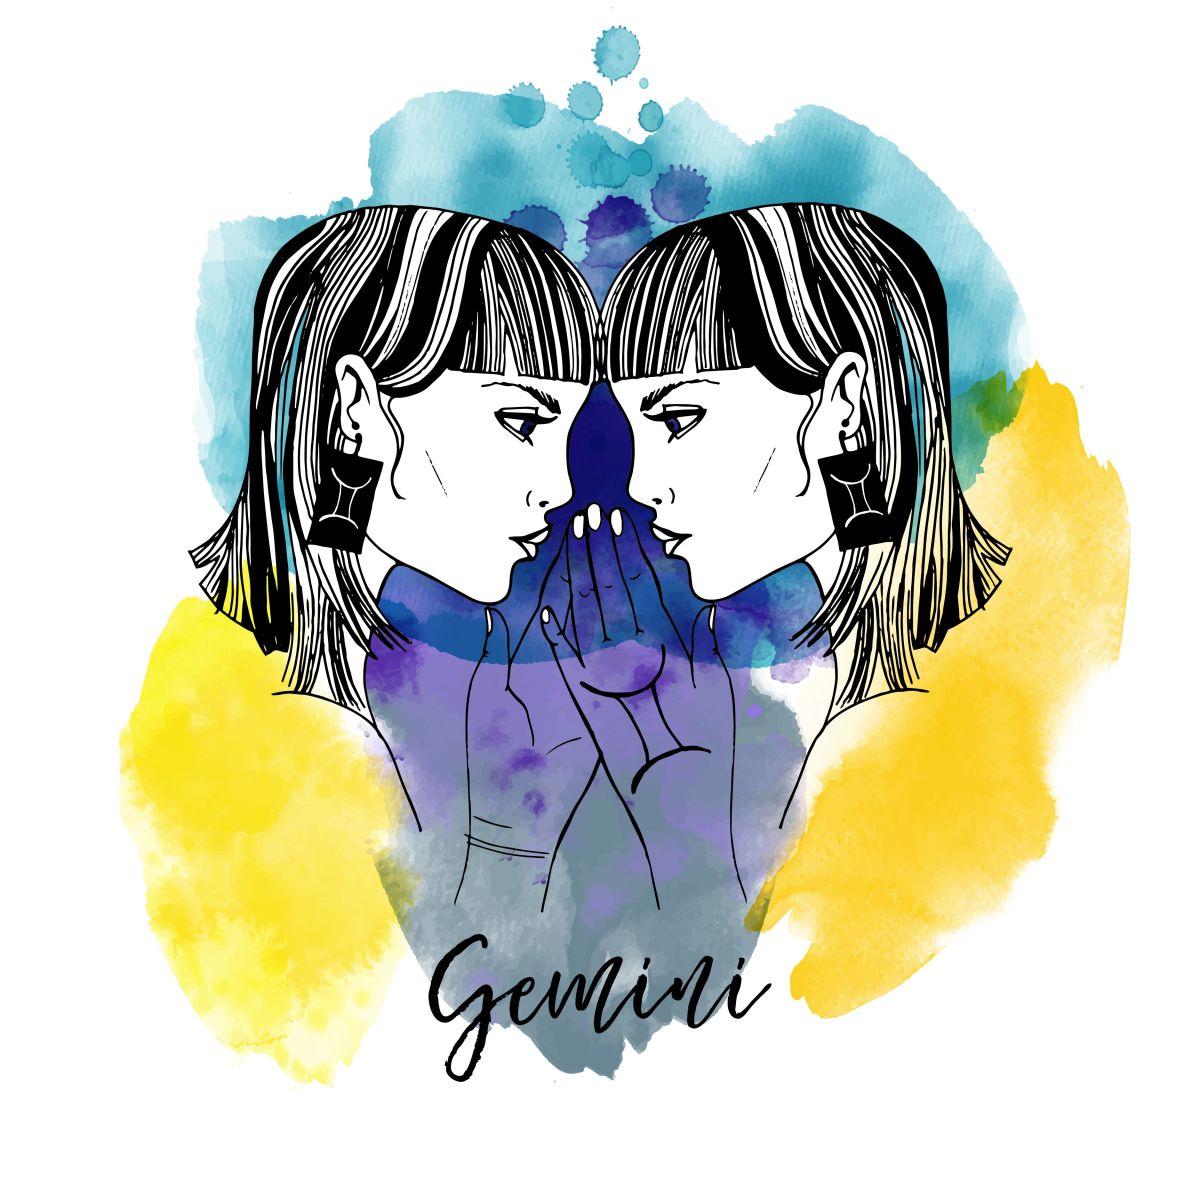 Horóscopo: Qué le espera al signo de Géminis en este mes de Enero de 2020